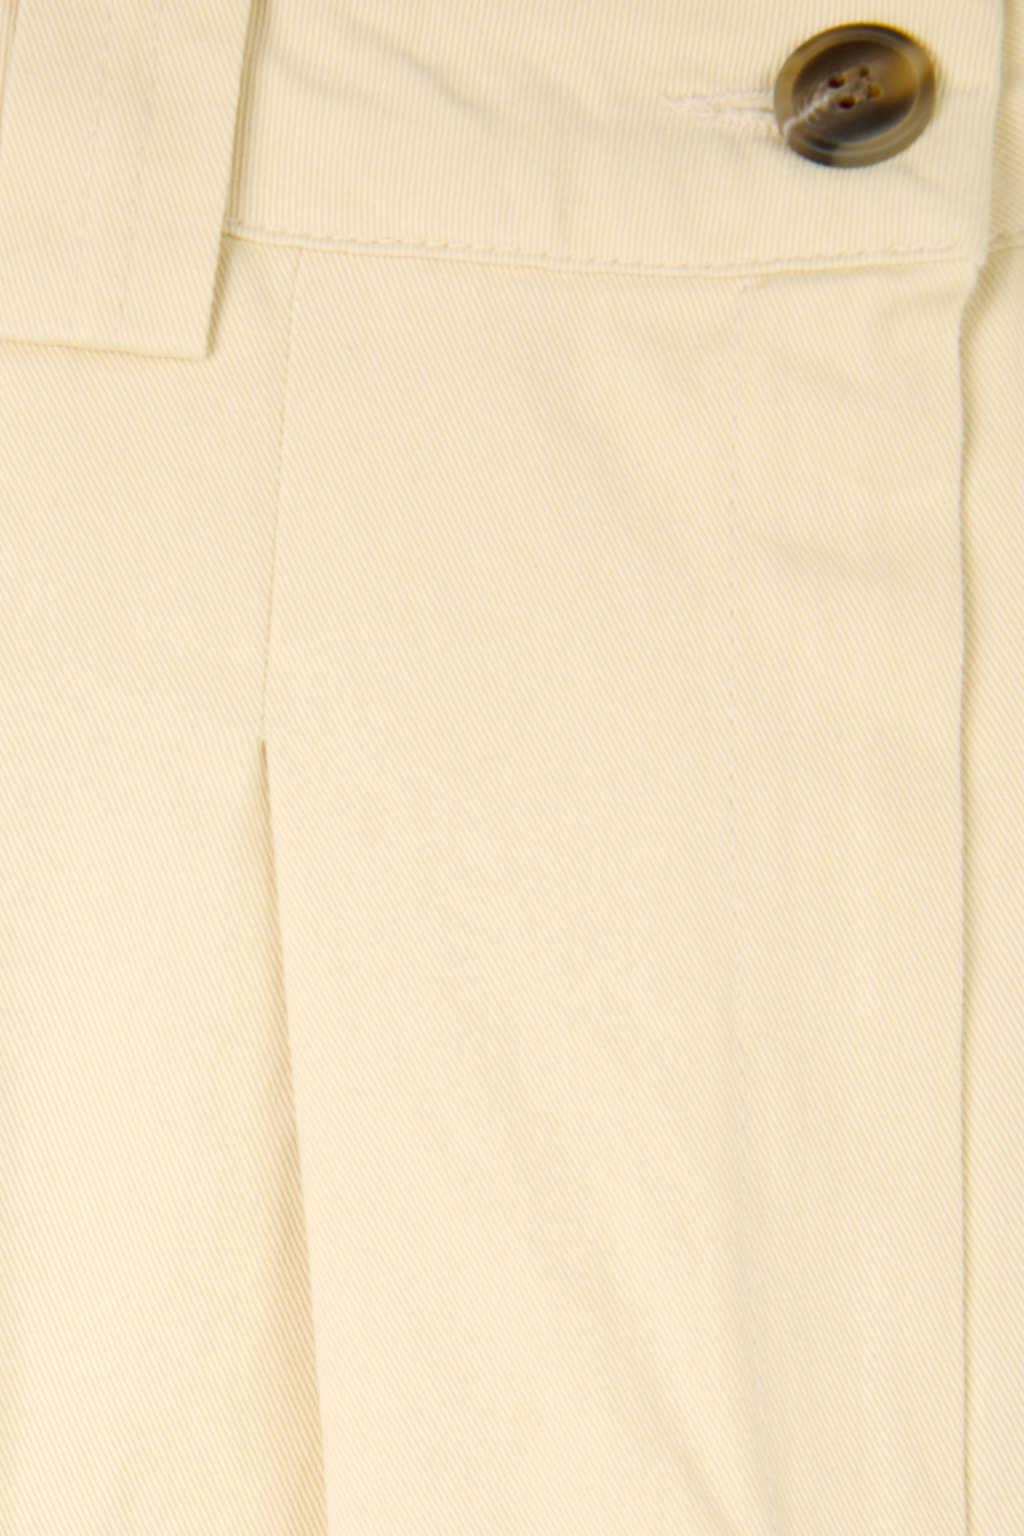 Pant K013 Yellow 6